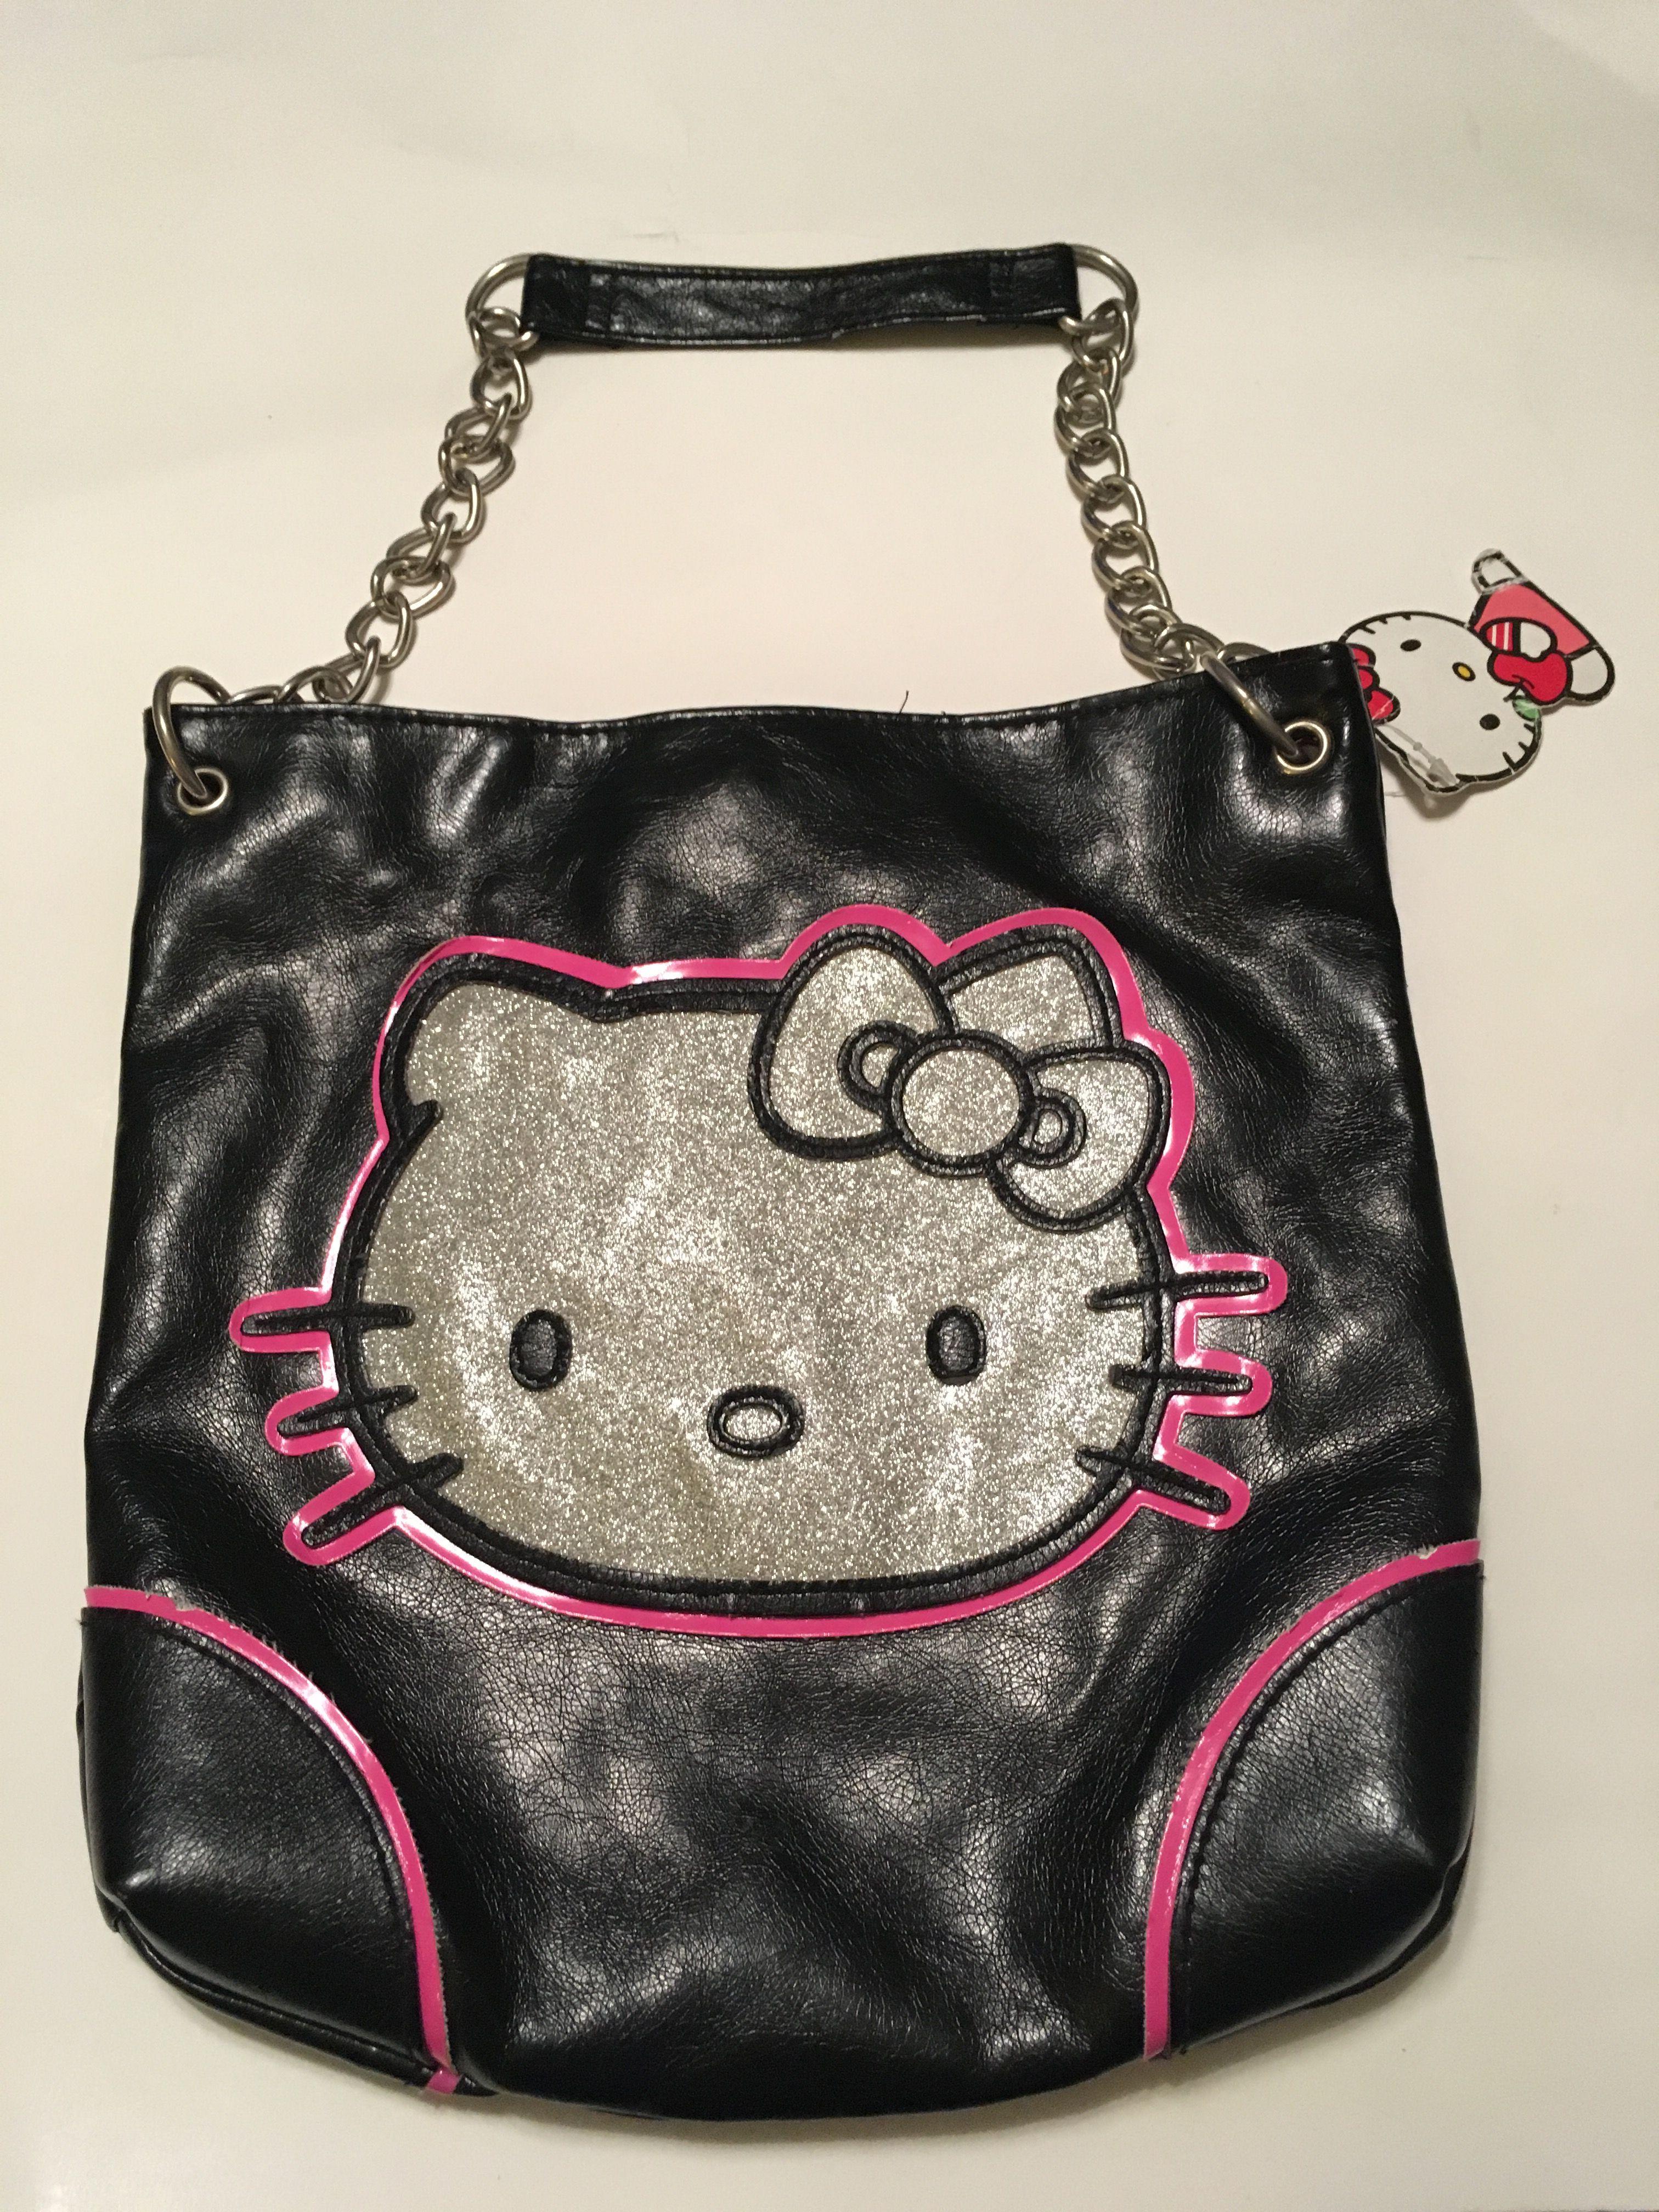 5f9953465 New Authentic Hello Kitty Black & Silver Glitter Face Shoulder Bag W/Chain  Strap.